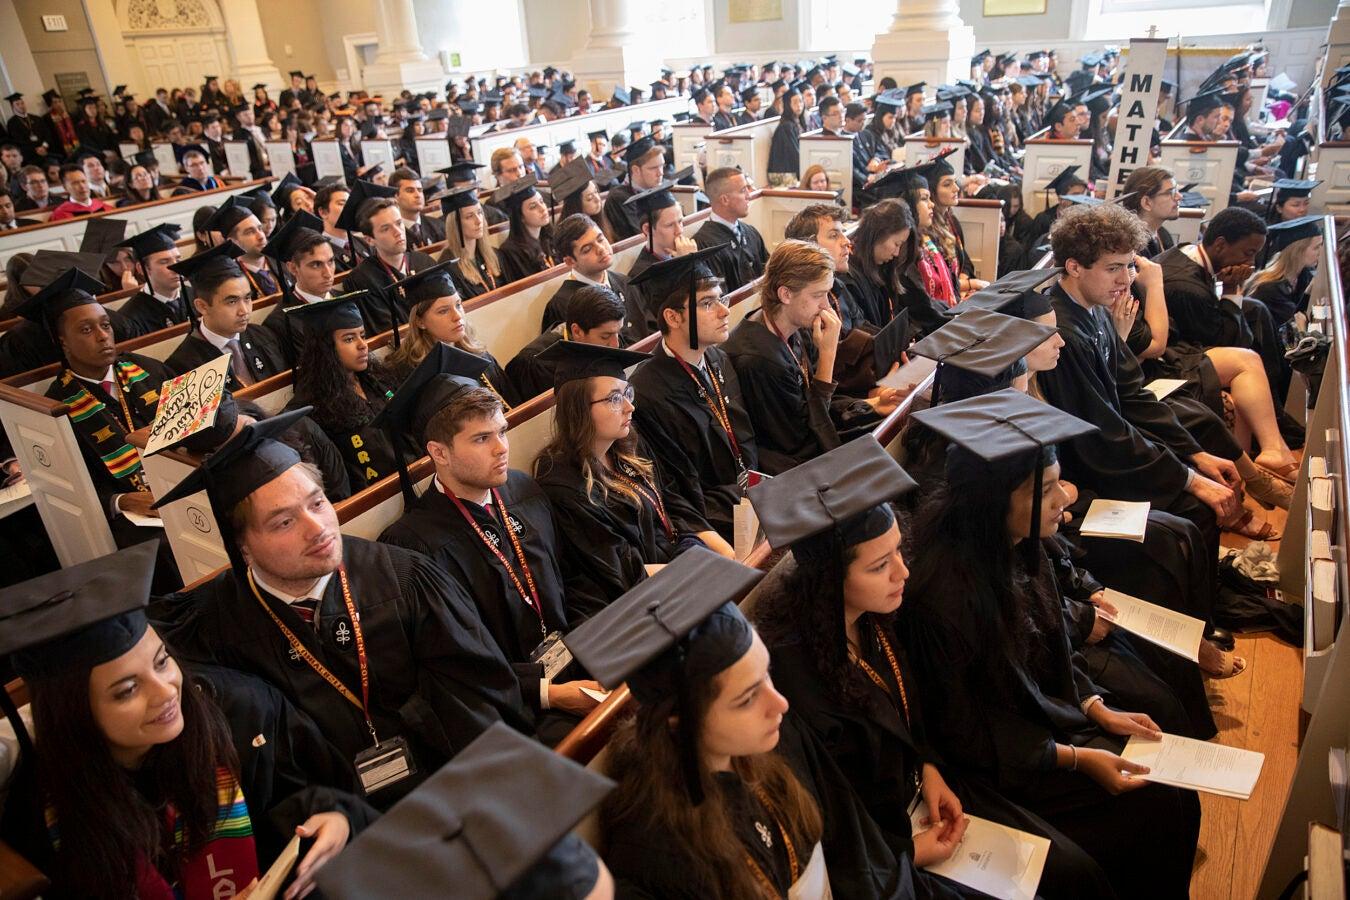 Students attend Senior Chapel service in Harvard Memorial Church